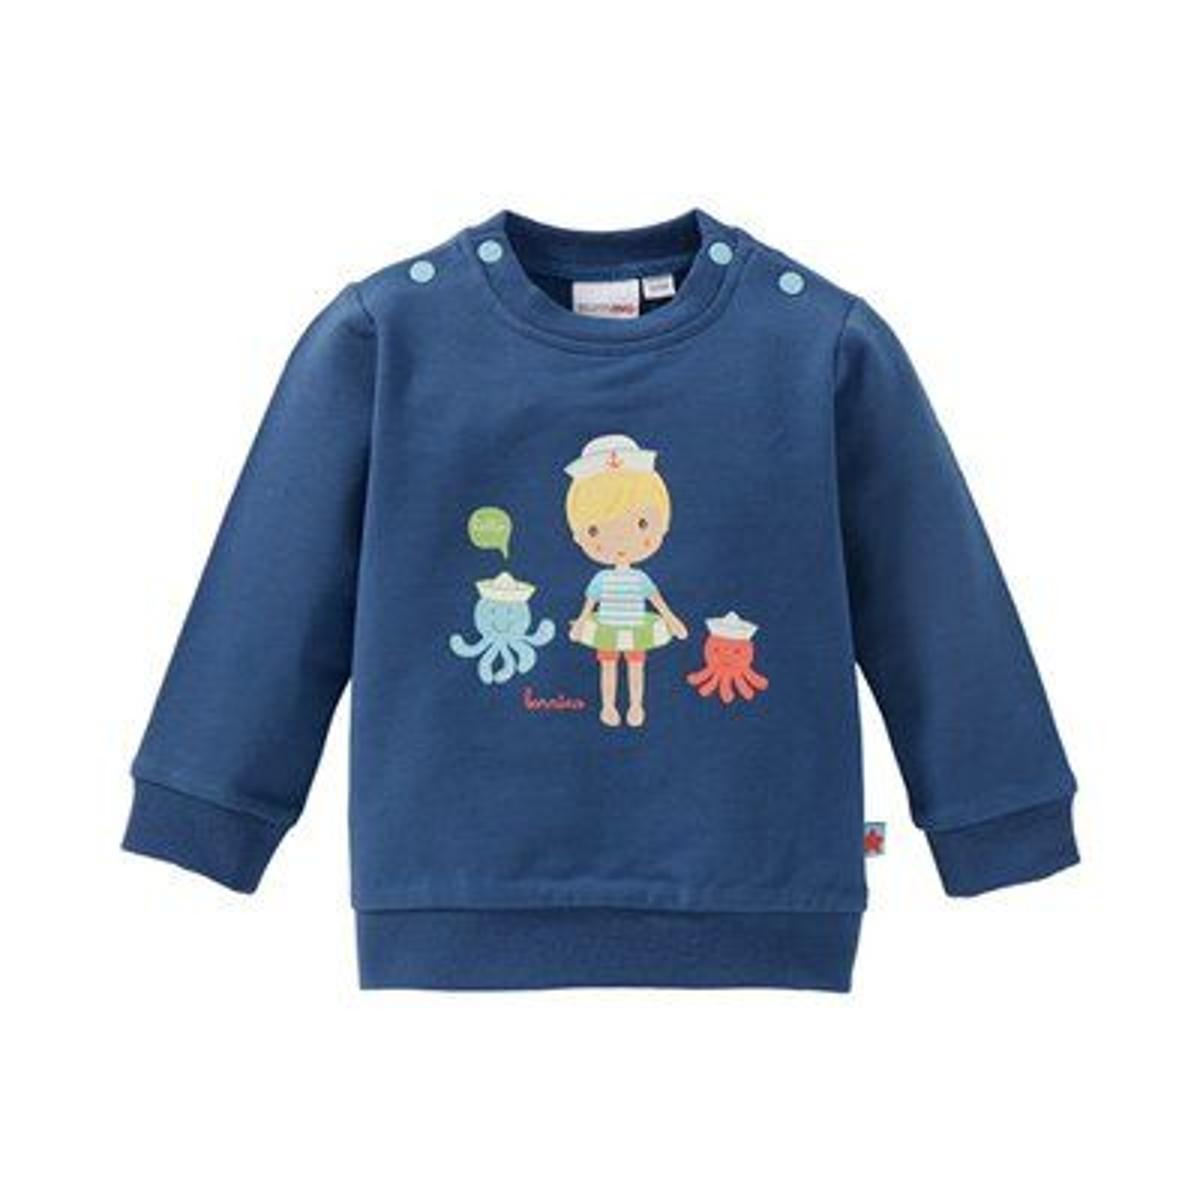 Bornino Sweat-shirt T-shirt bébé vêtements bébé